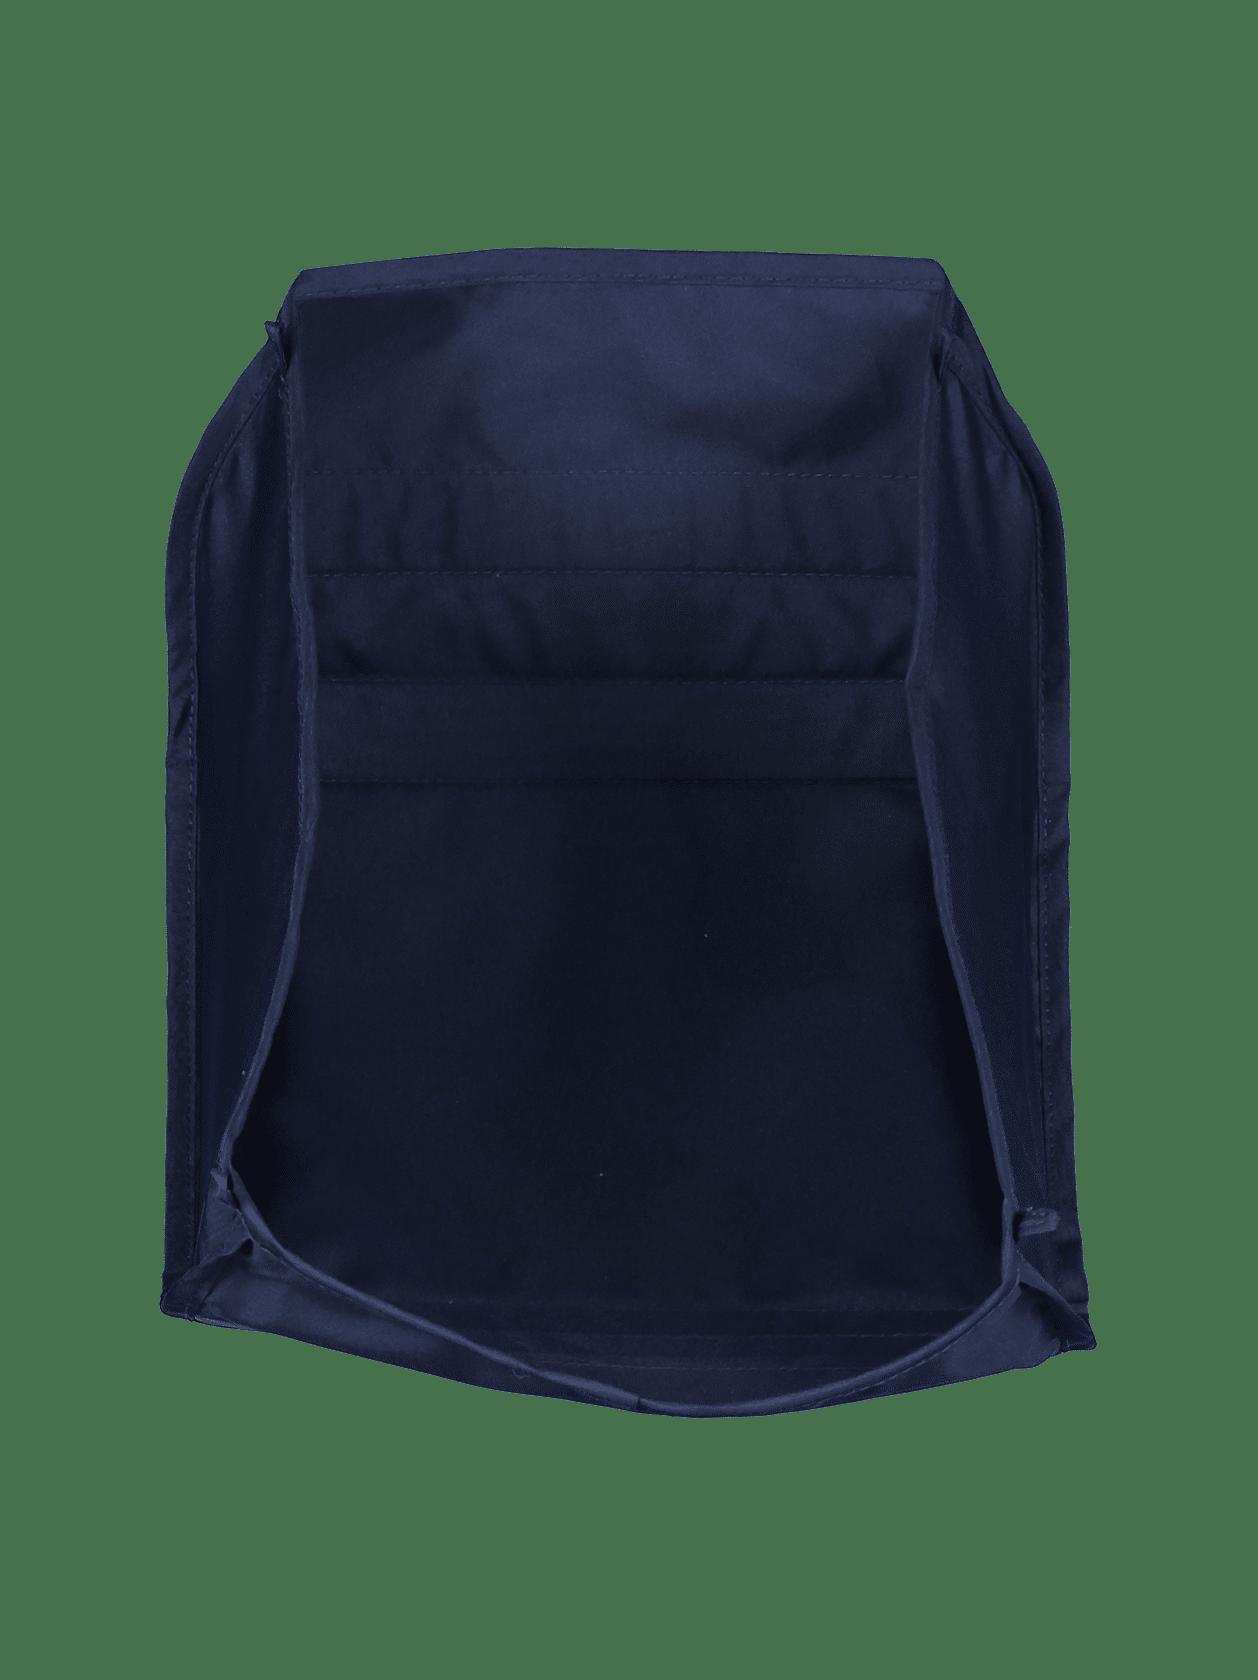 MiPeach Basket - Royal